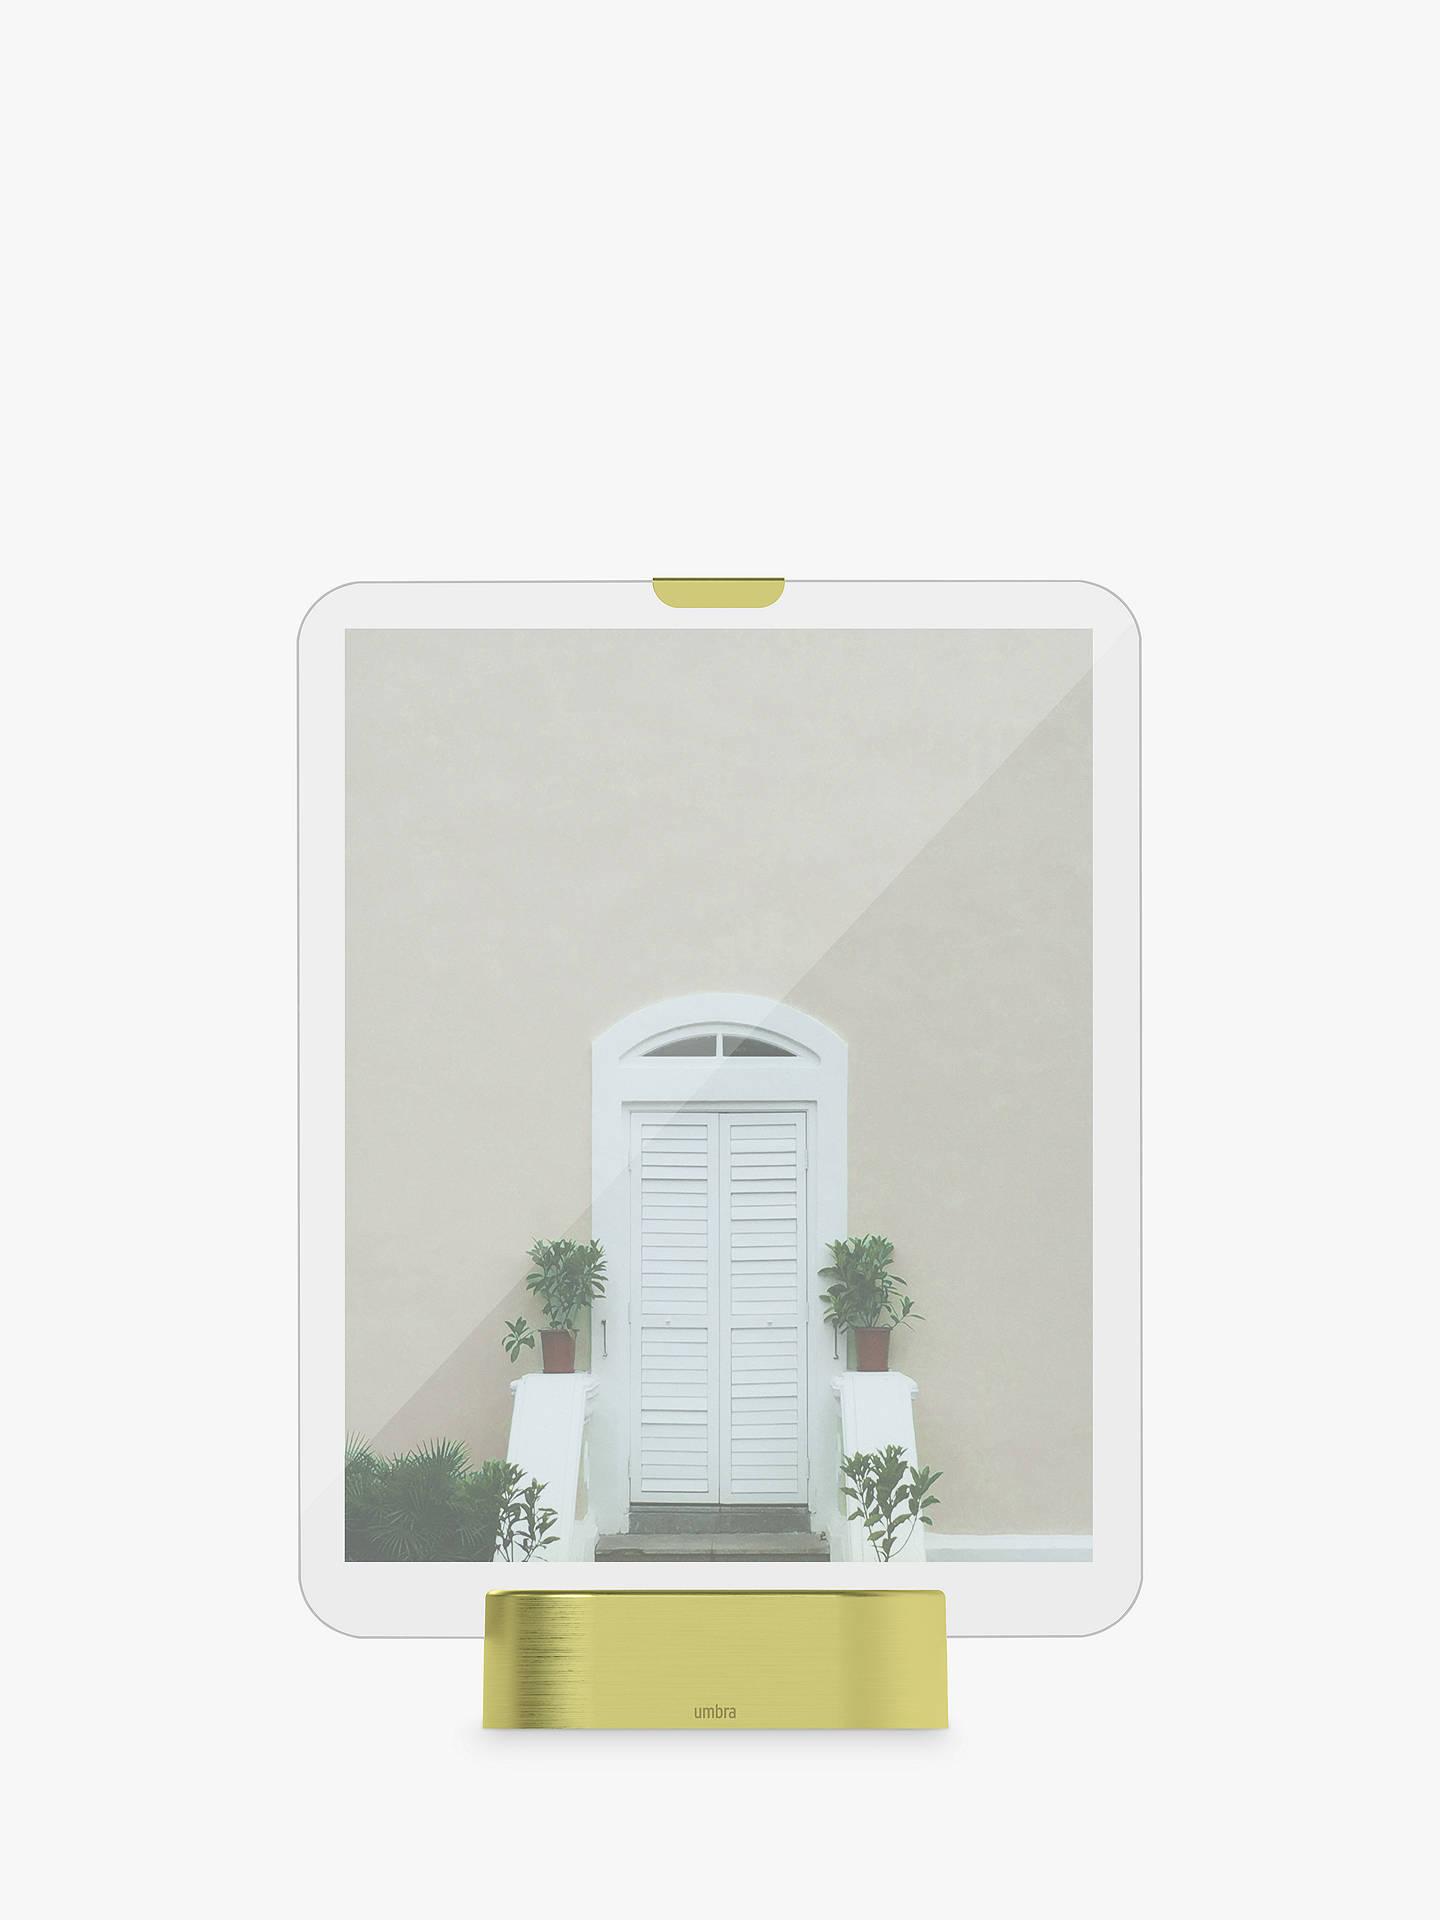 Umbra Glo LED Freestanding Photo Frame, 8 x 10